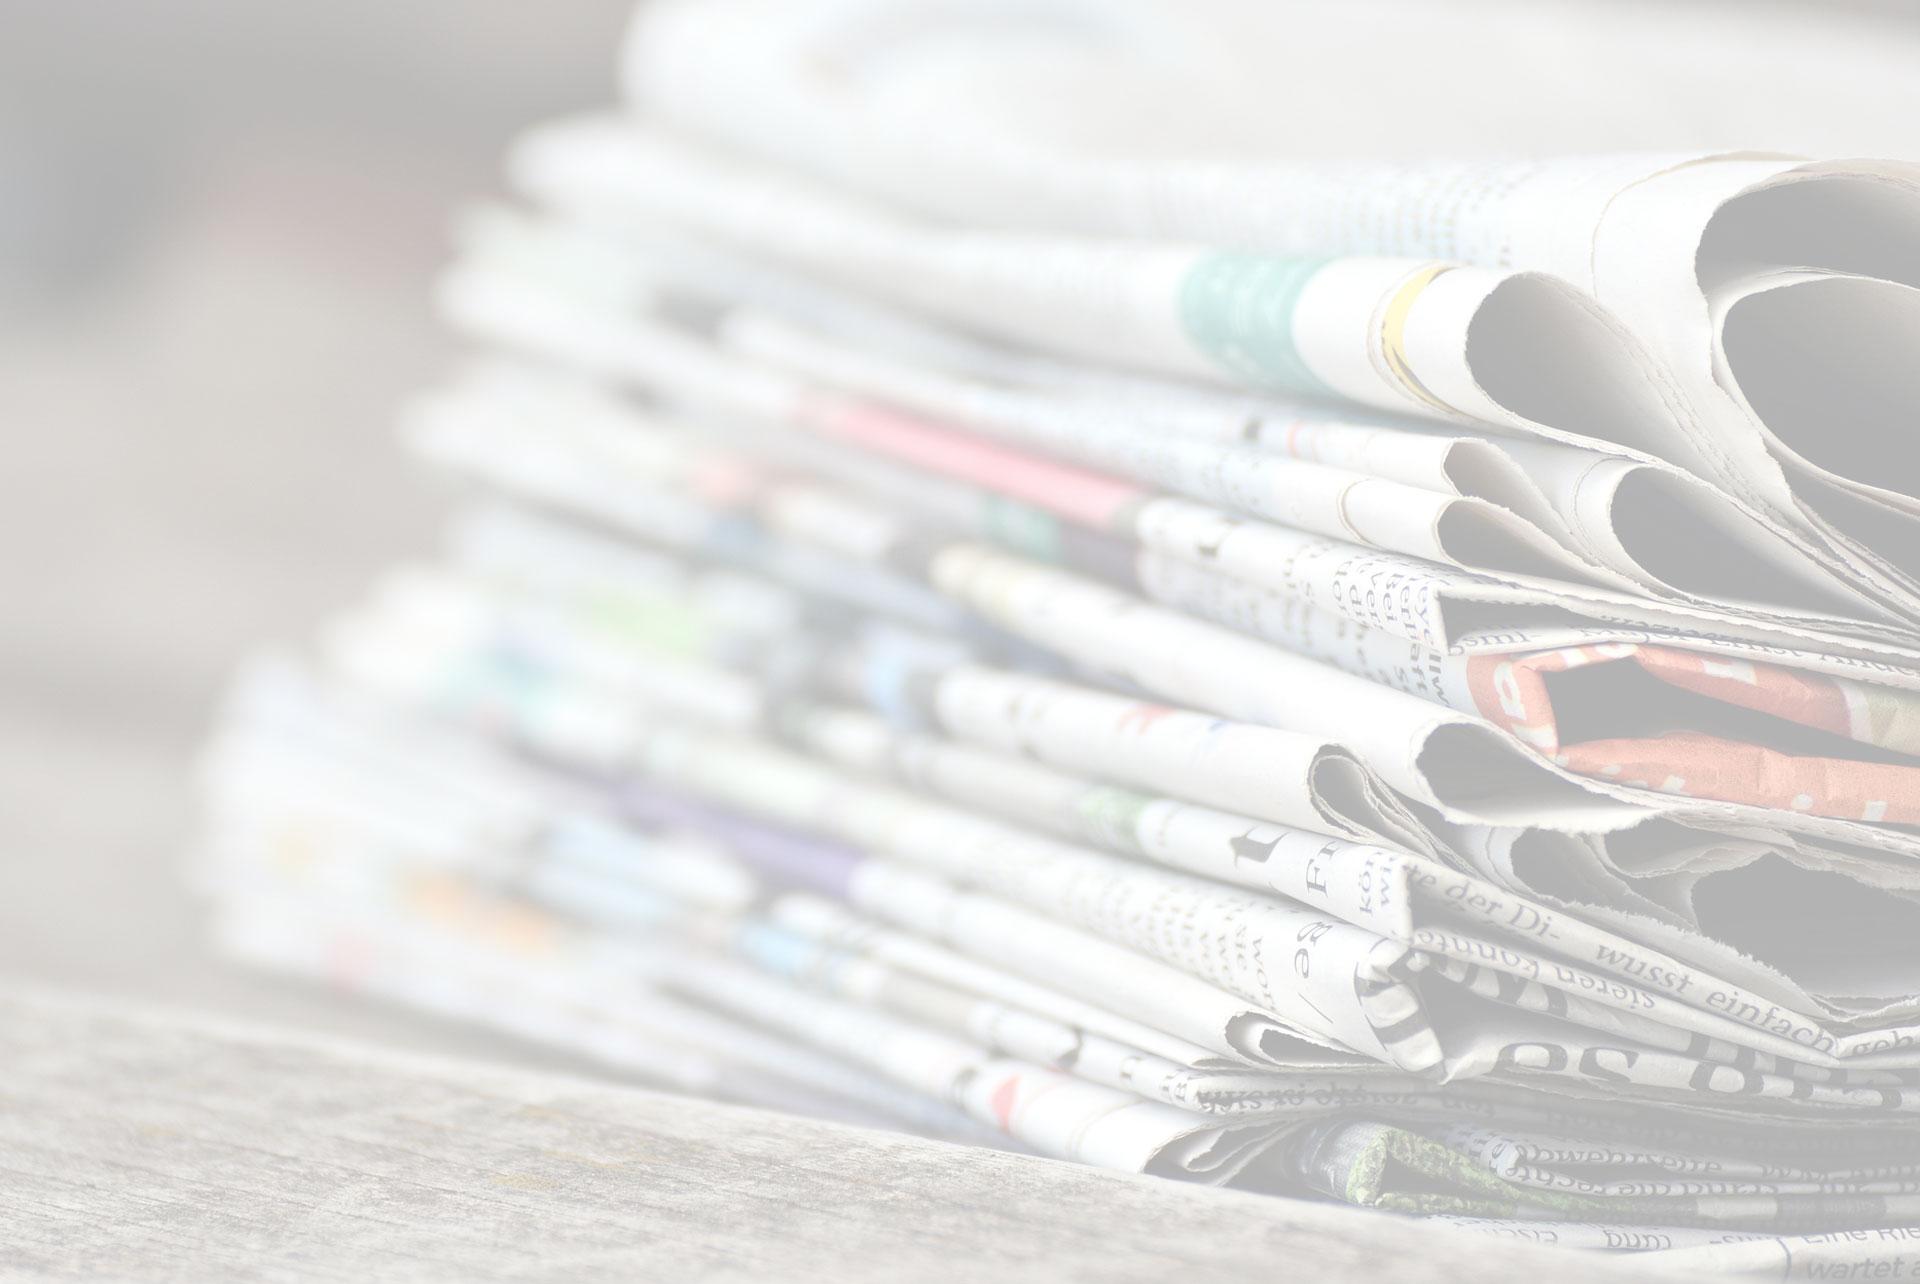 Juventus premiazione 2017